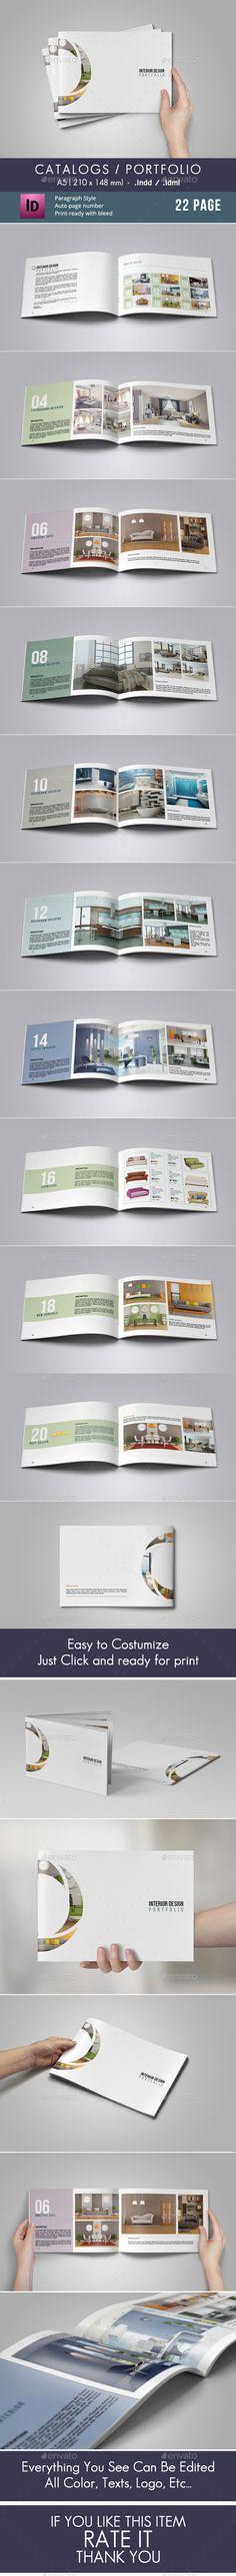 Catalogs / Portfolio Portfolio Brochure Template by adekfotografia. Indesign Templates, Flyer Design Templates, Brochure Template, Number Fonts, Catalog Design, Brochure Design, Editorial Design, Photo Book, Layout Design